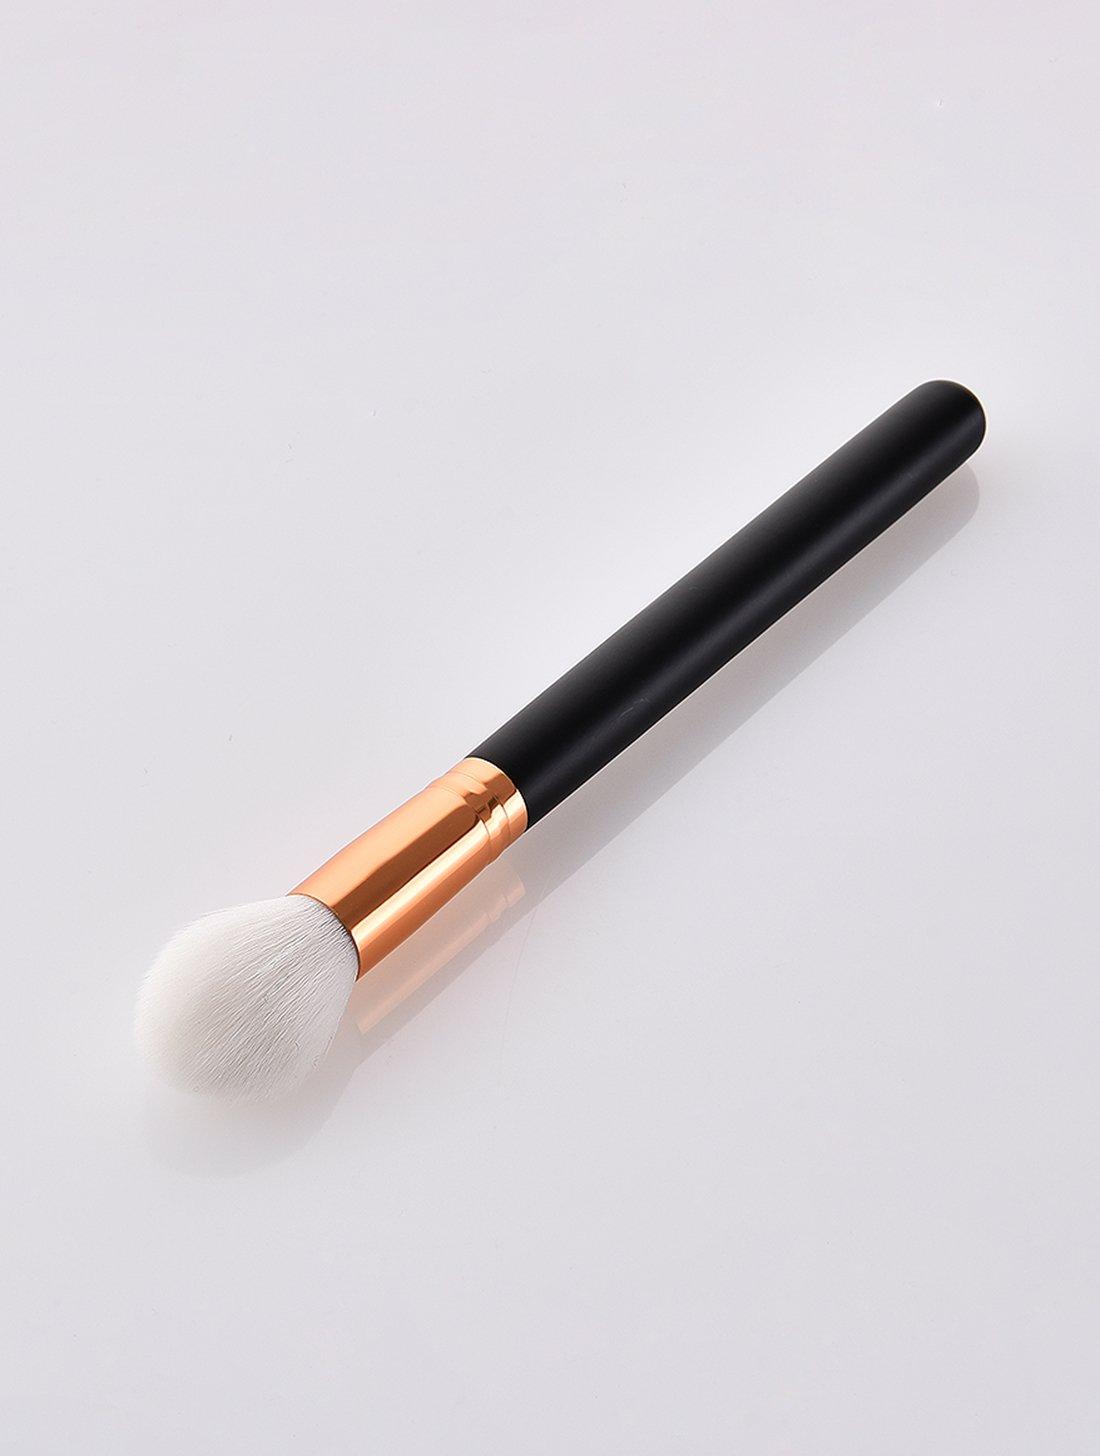 Straight Makeup Brush 1pc soft makeup brush 1pc